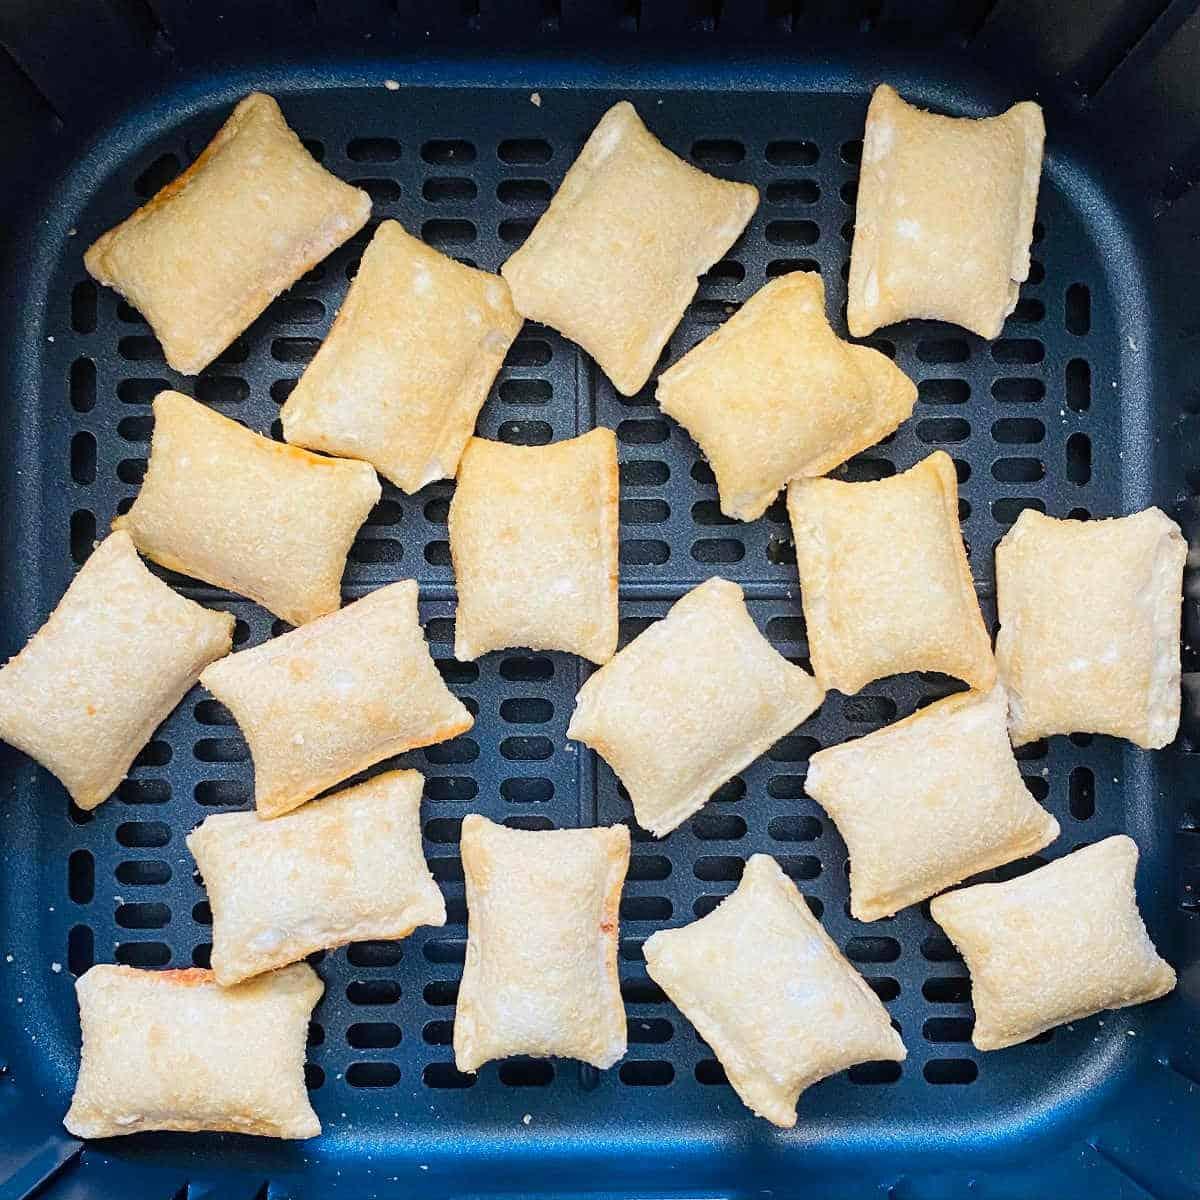 totinos pizza rolls in air fryer basket